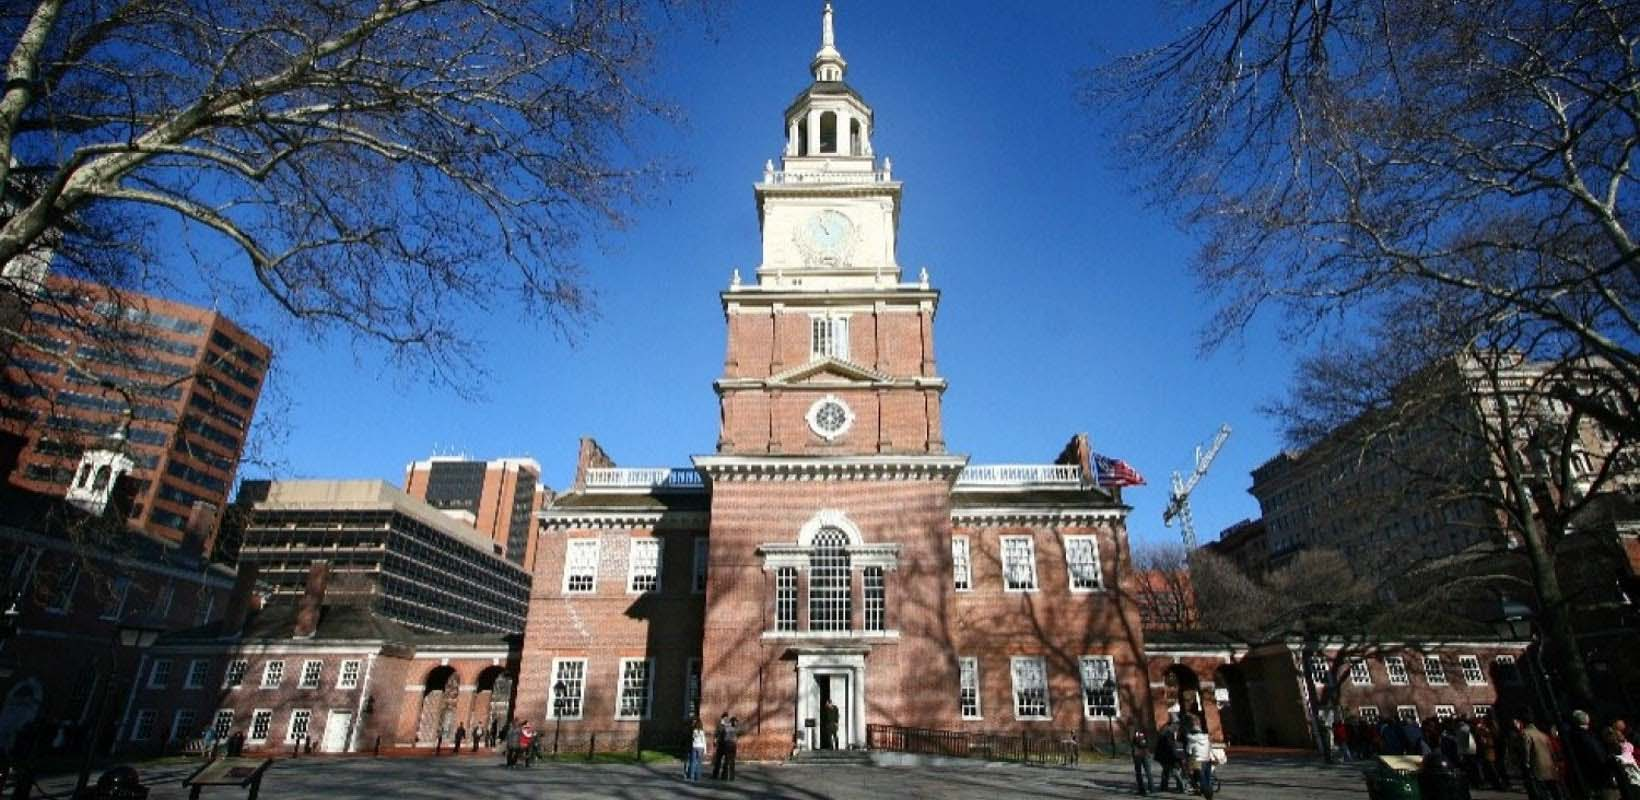 History in HD guided walking tour in Philadelphia